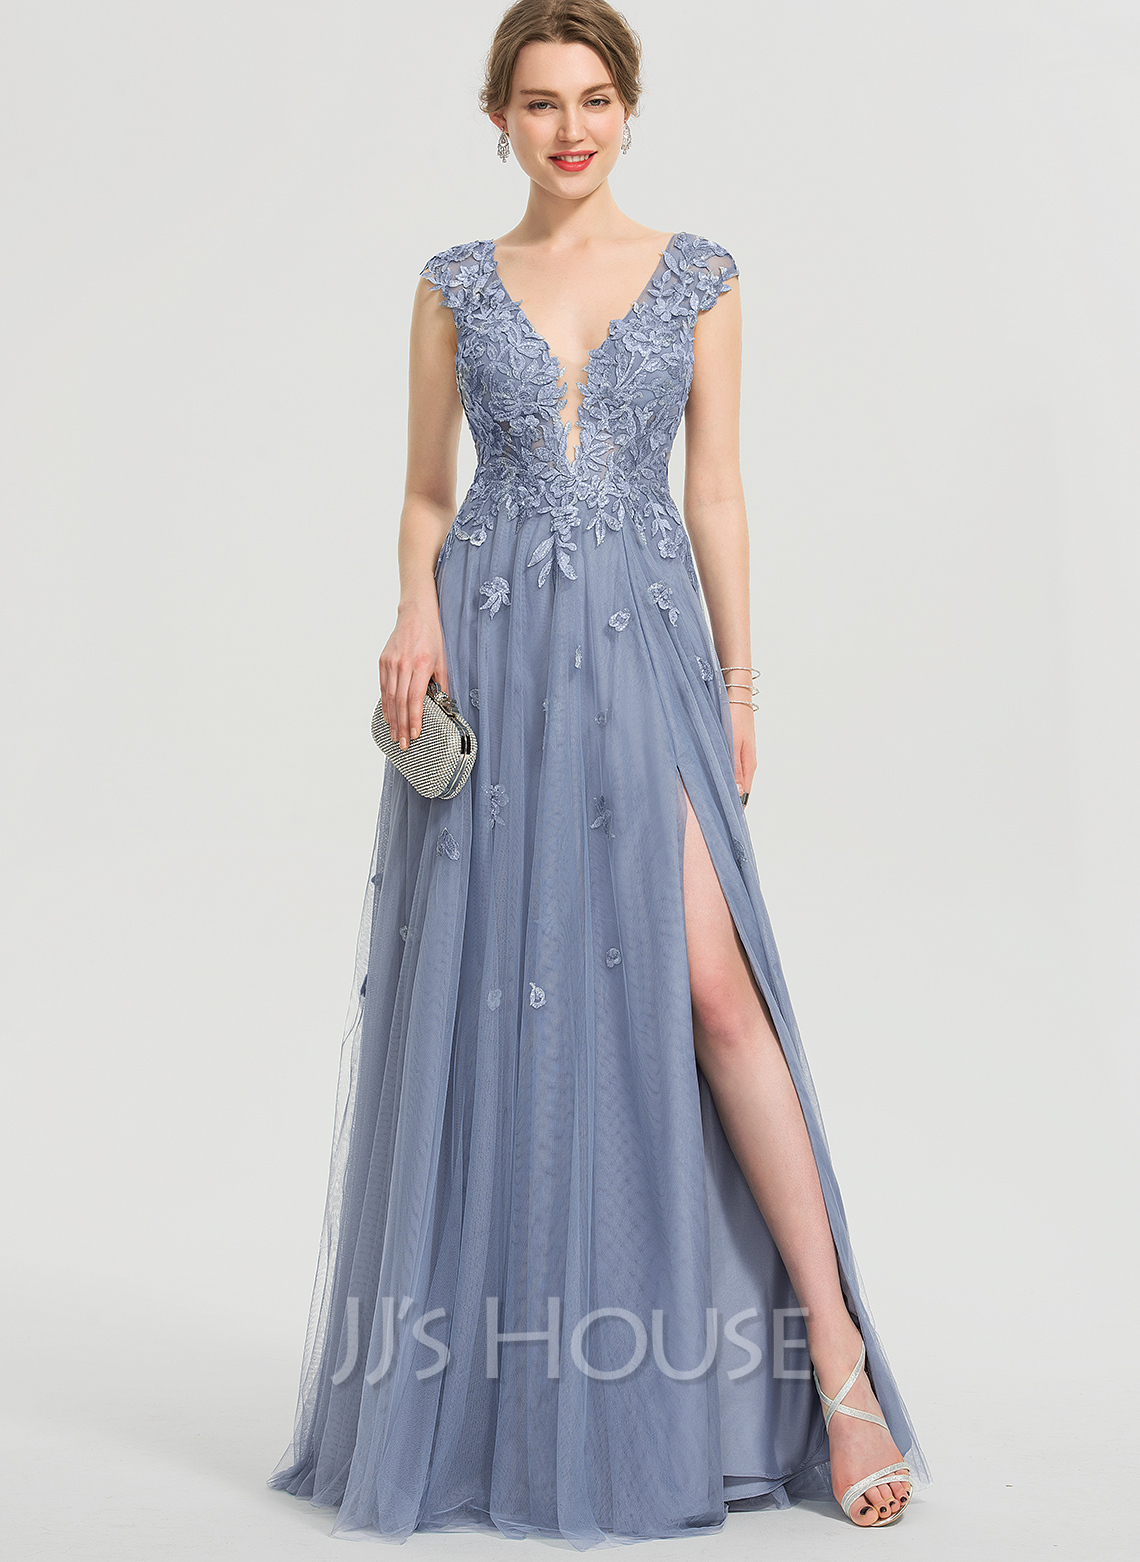 A-Line V-neck Floor-Length Tulle Prom Dresses With Sequins Split Front